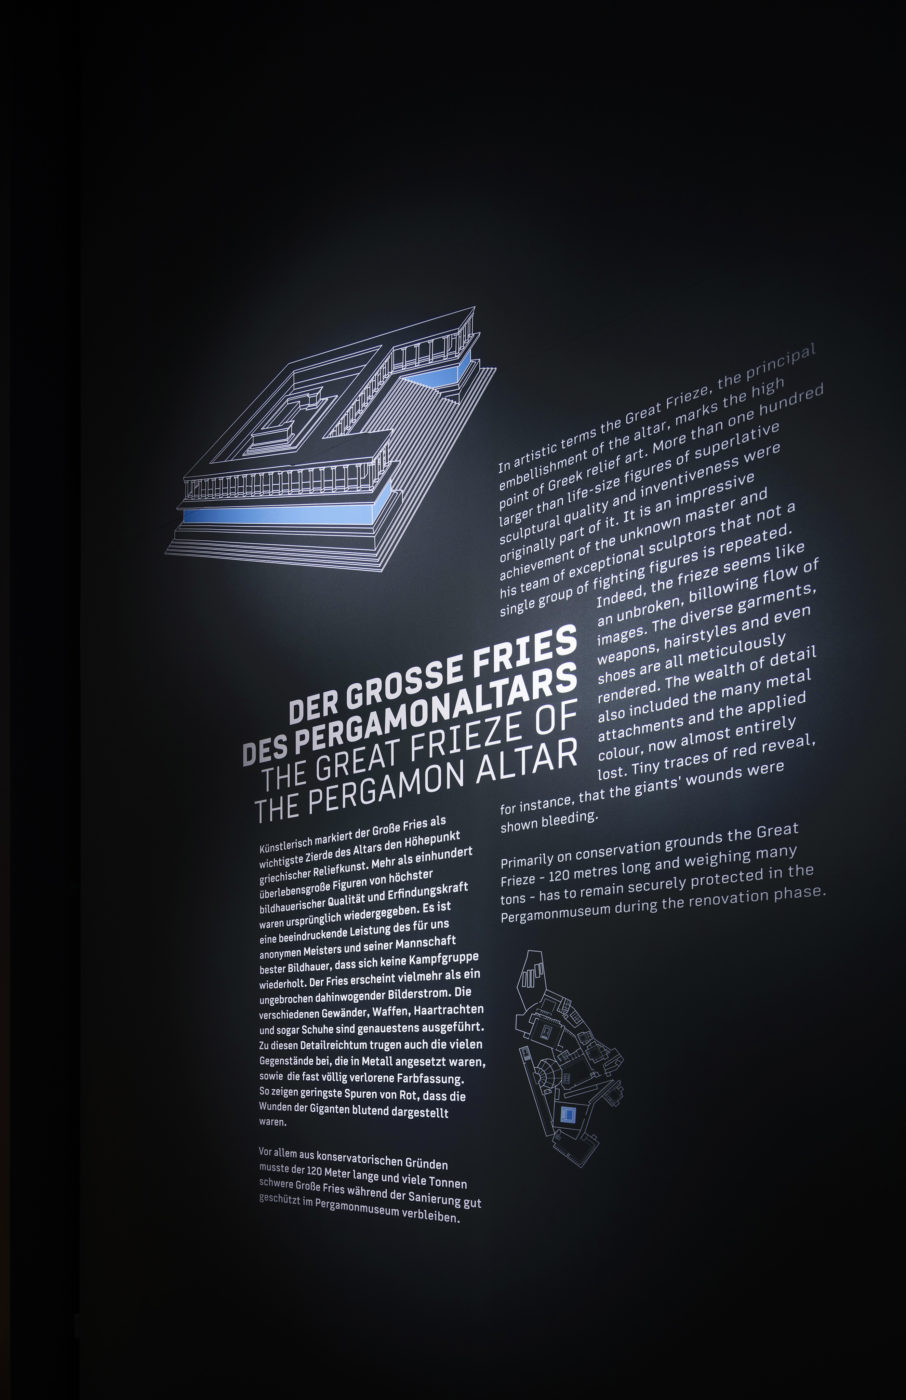 Museumsinsel Berlin Pergamonaltar Ausstellung Panorama Grafik Typografie Beschreibungstext